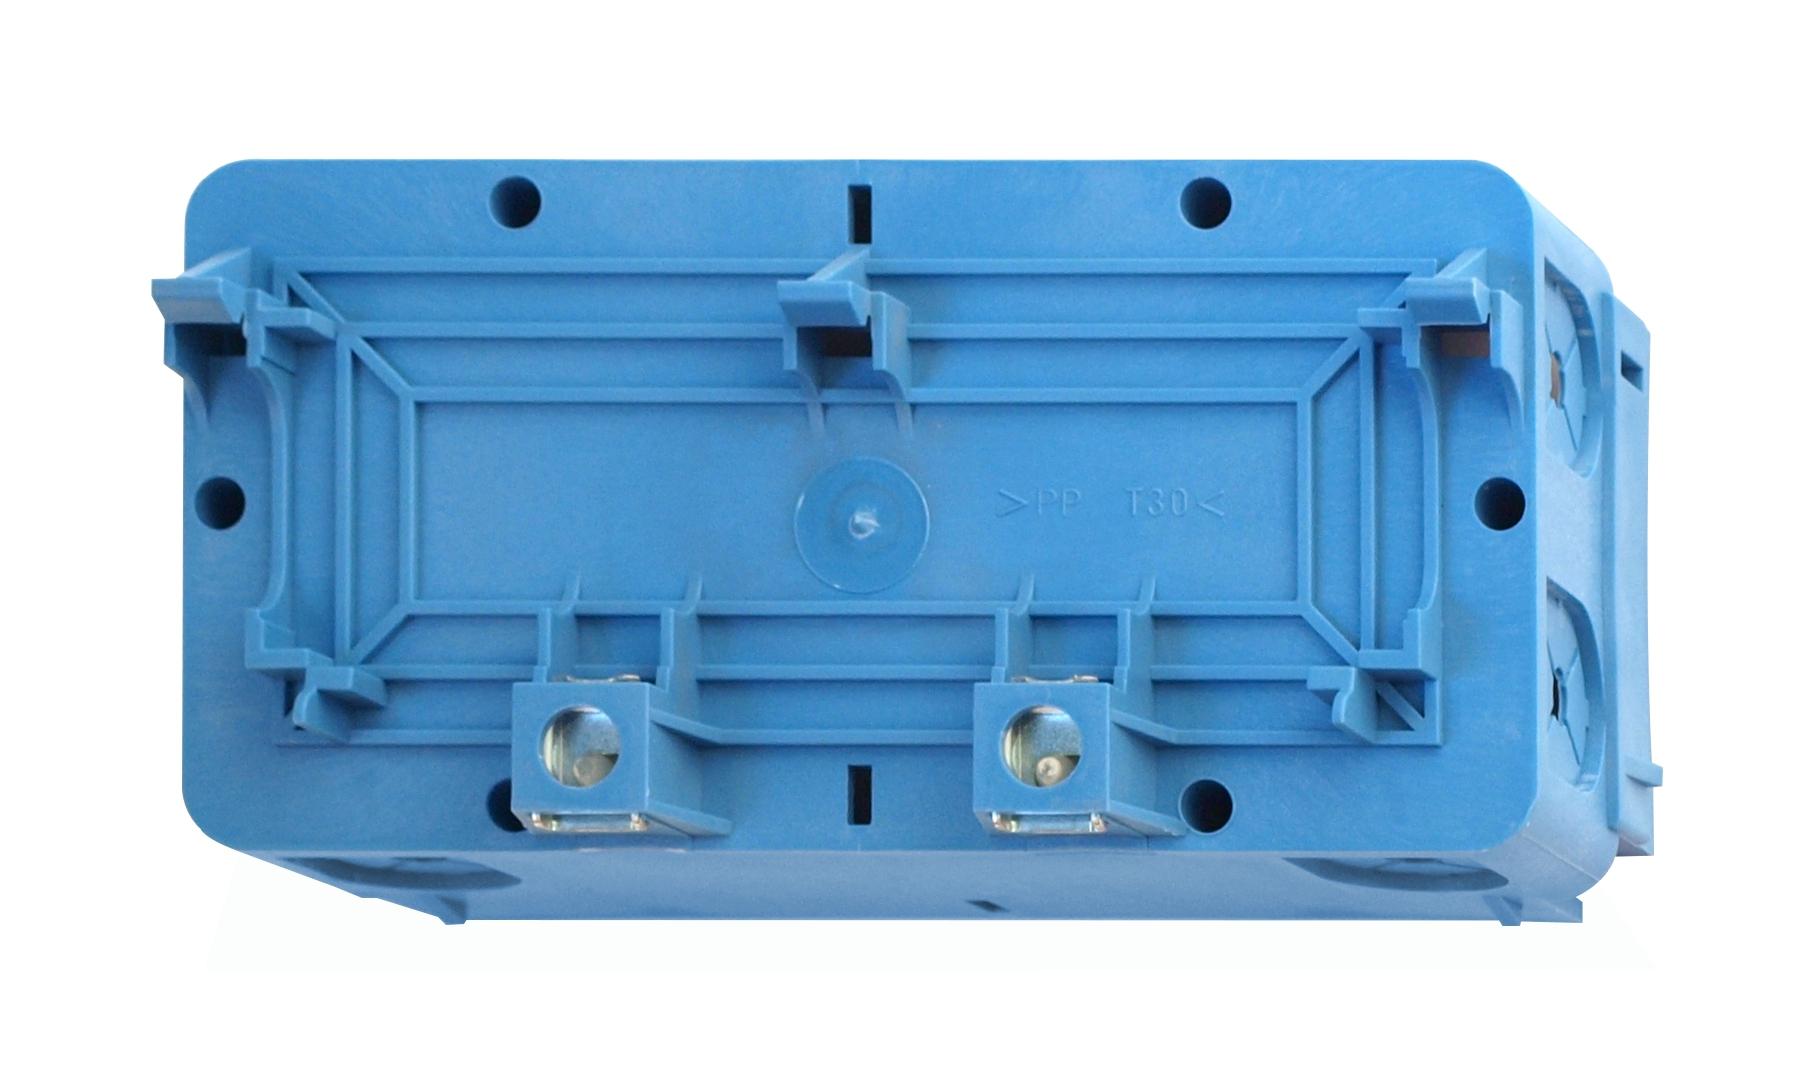 1 Stk Doppelgeräteeinbaudose Signo blau RH727771--